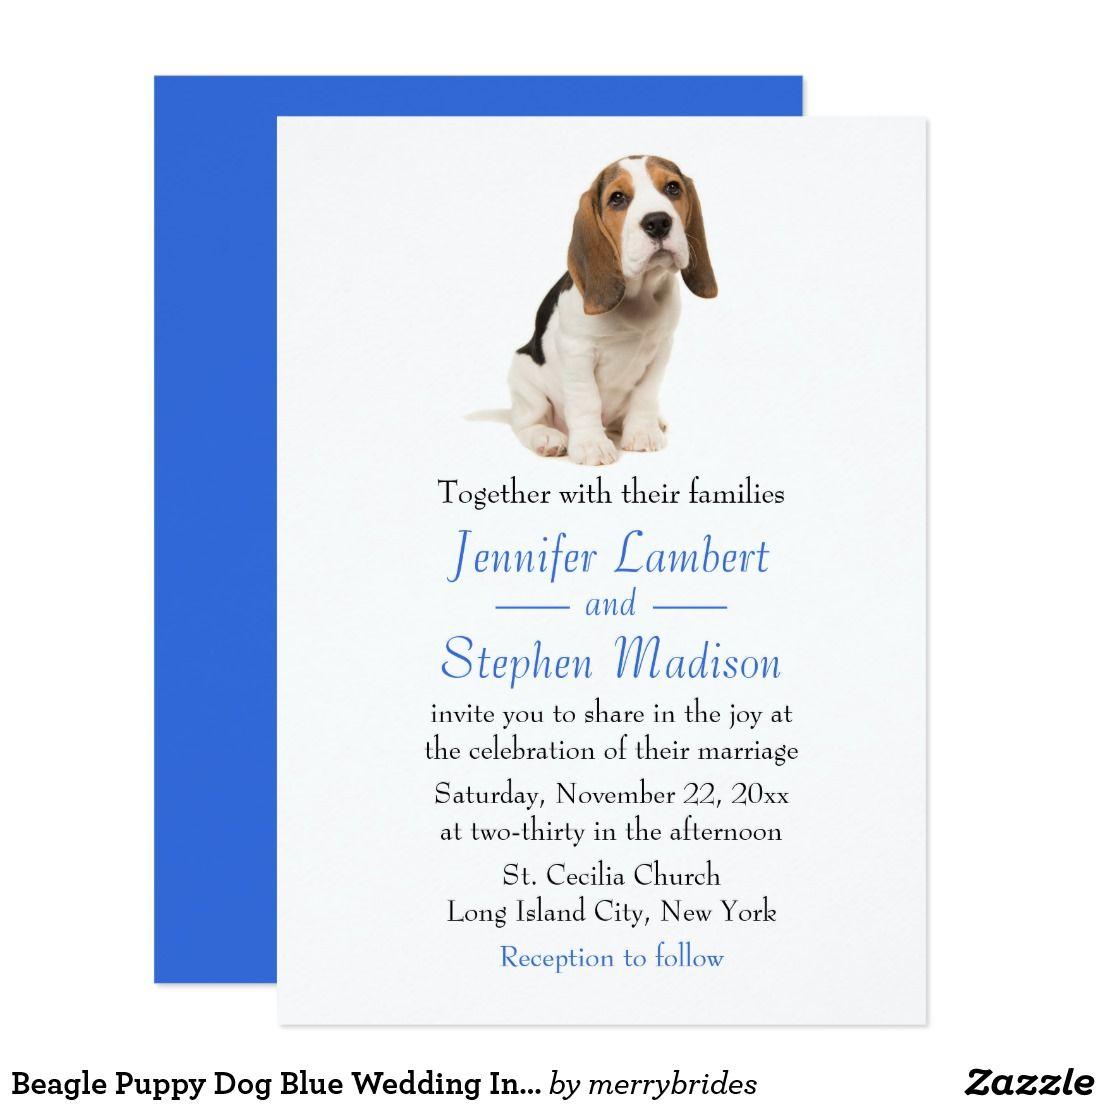 Beagle Puppy Dog Blue Wedding Invitation Zazzle Com Blue